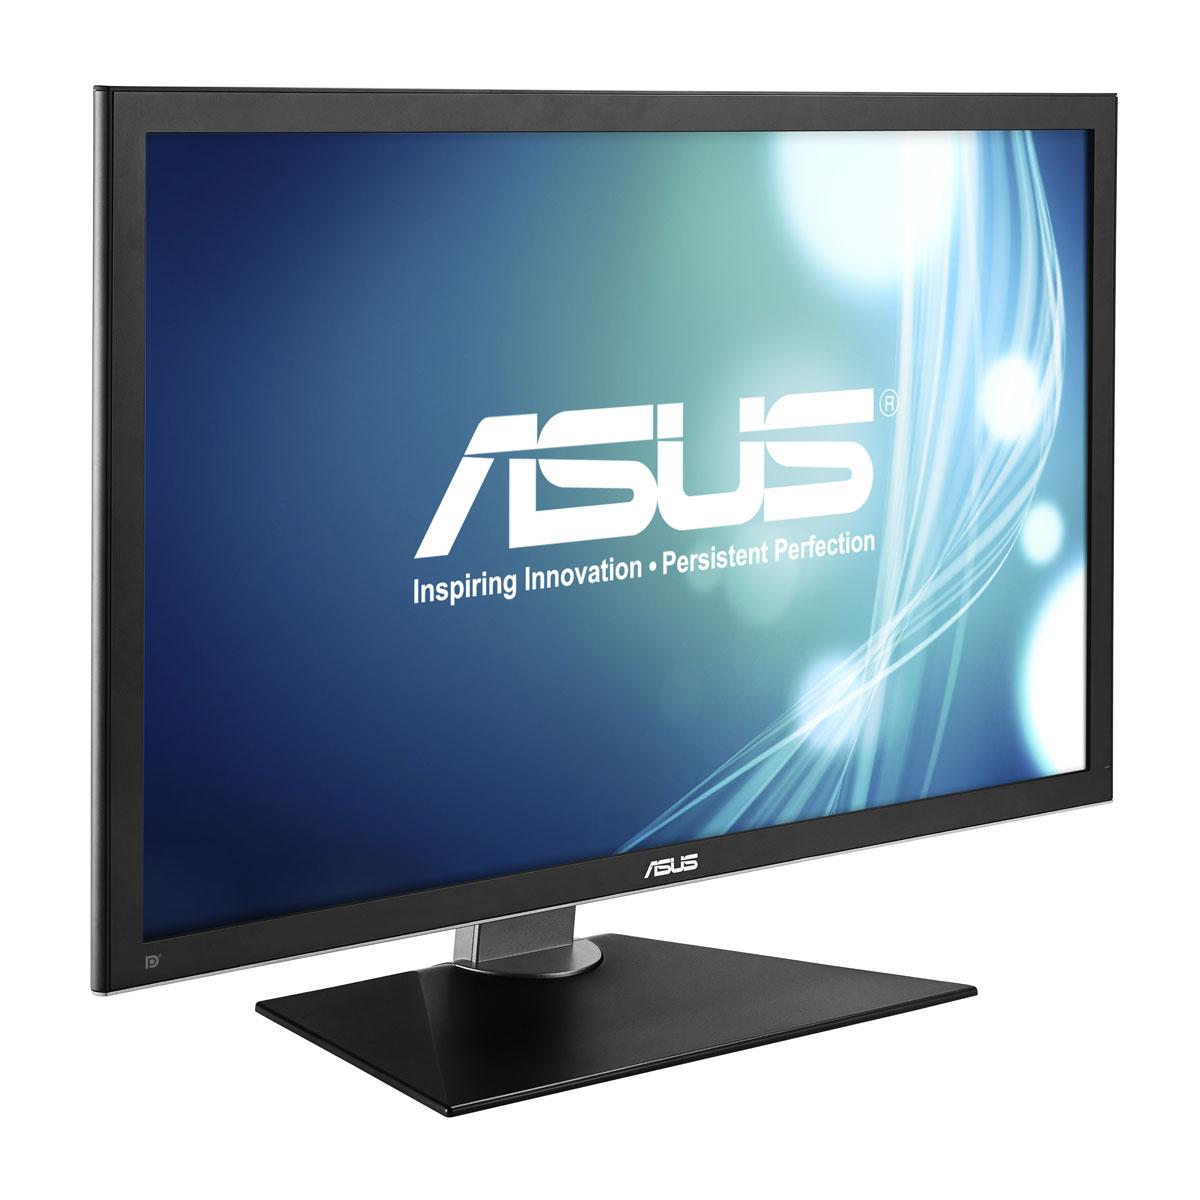 "Ecran PC WLED 31,5"" Asus PQ321QE - 3840 X 2160 - 8ms - HDMI"